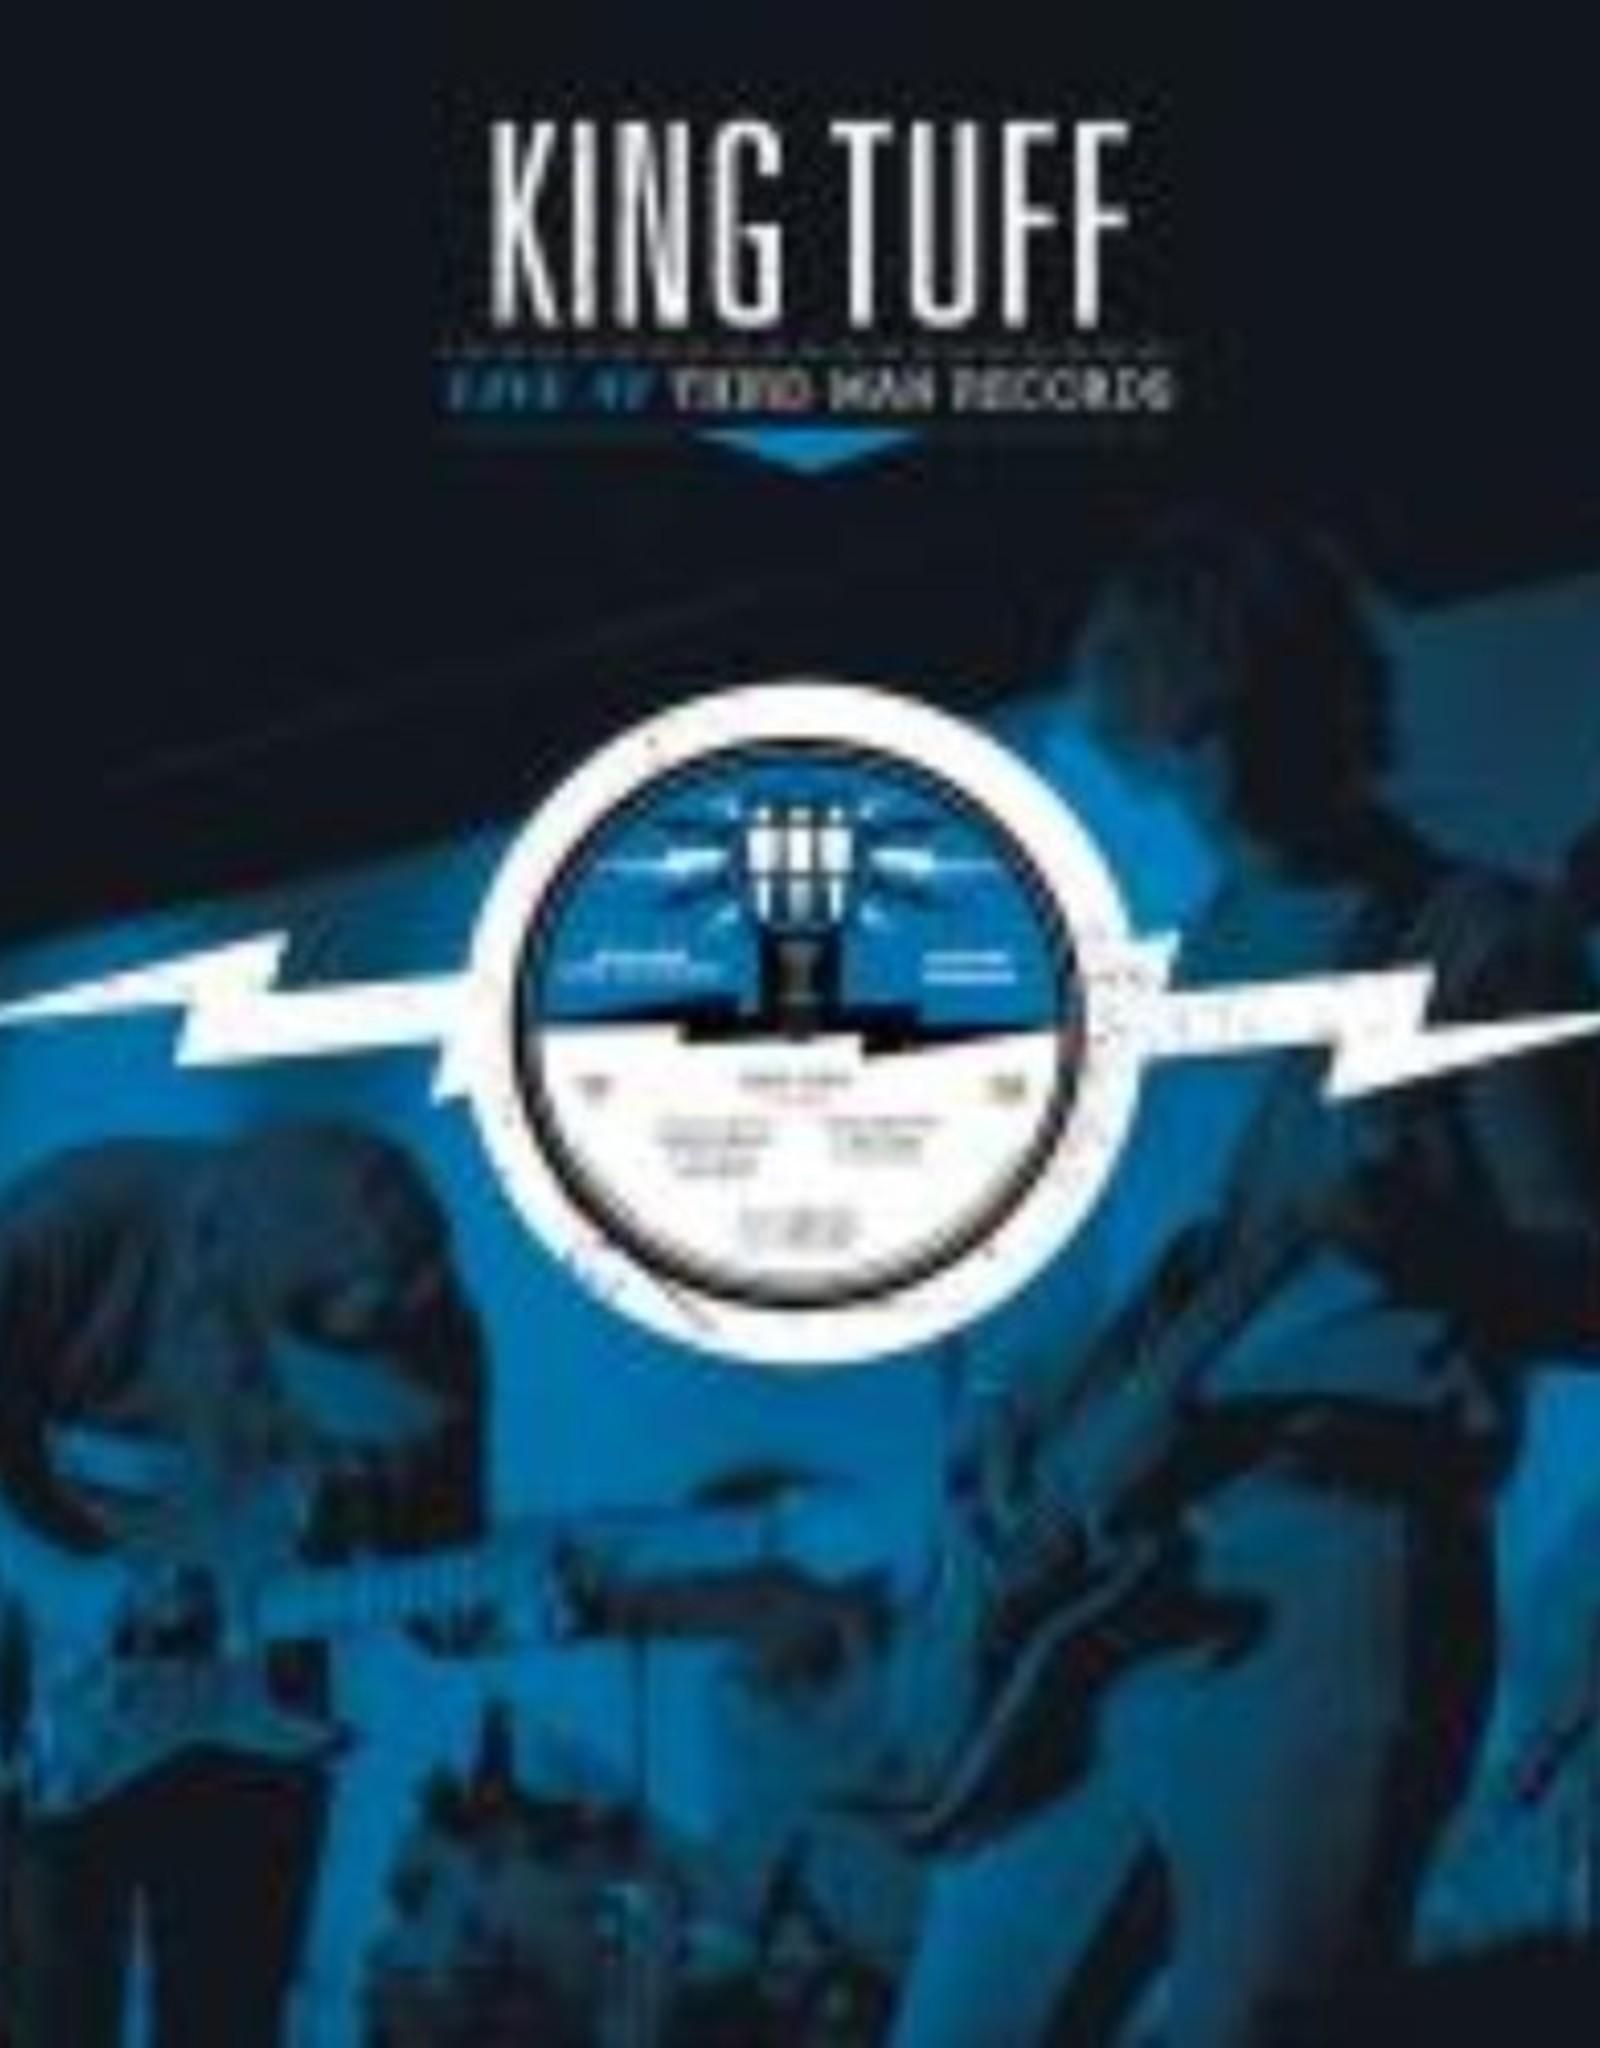 "King Tuff - Live At Third Man Records (12"" Vinyl)"